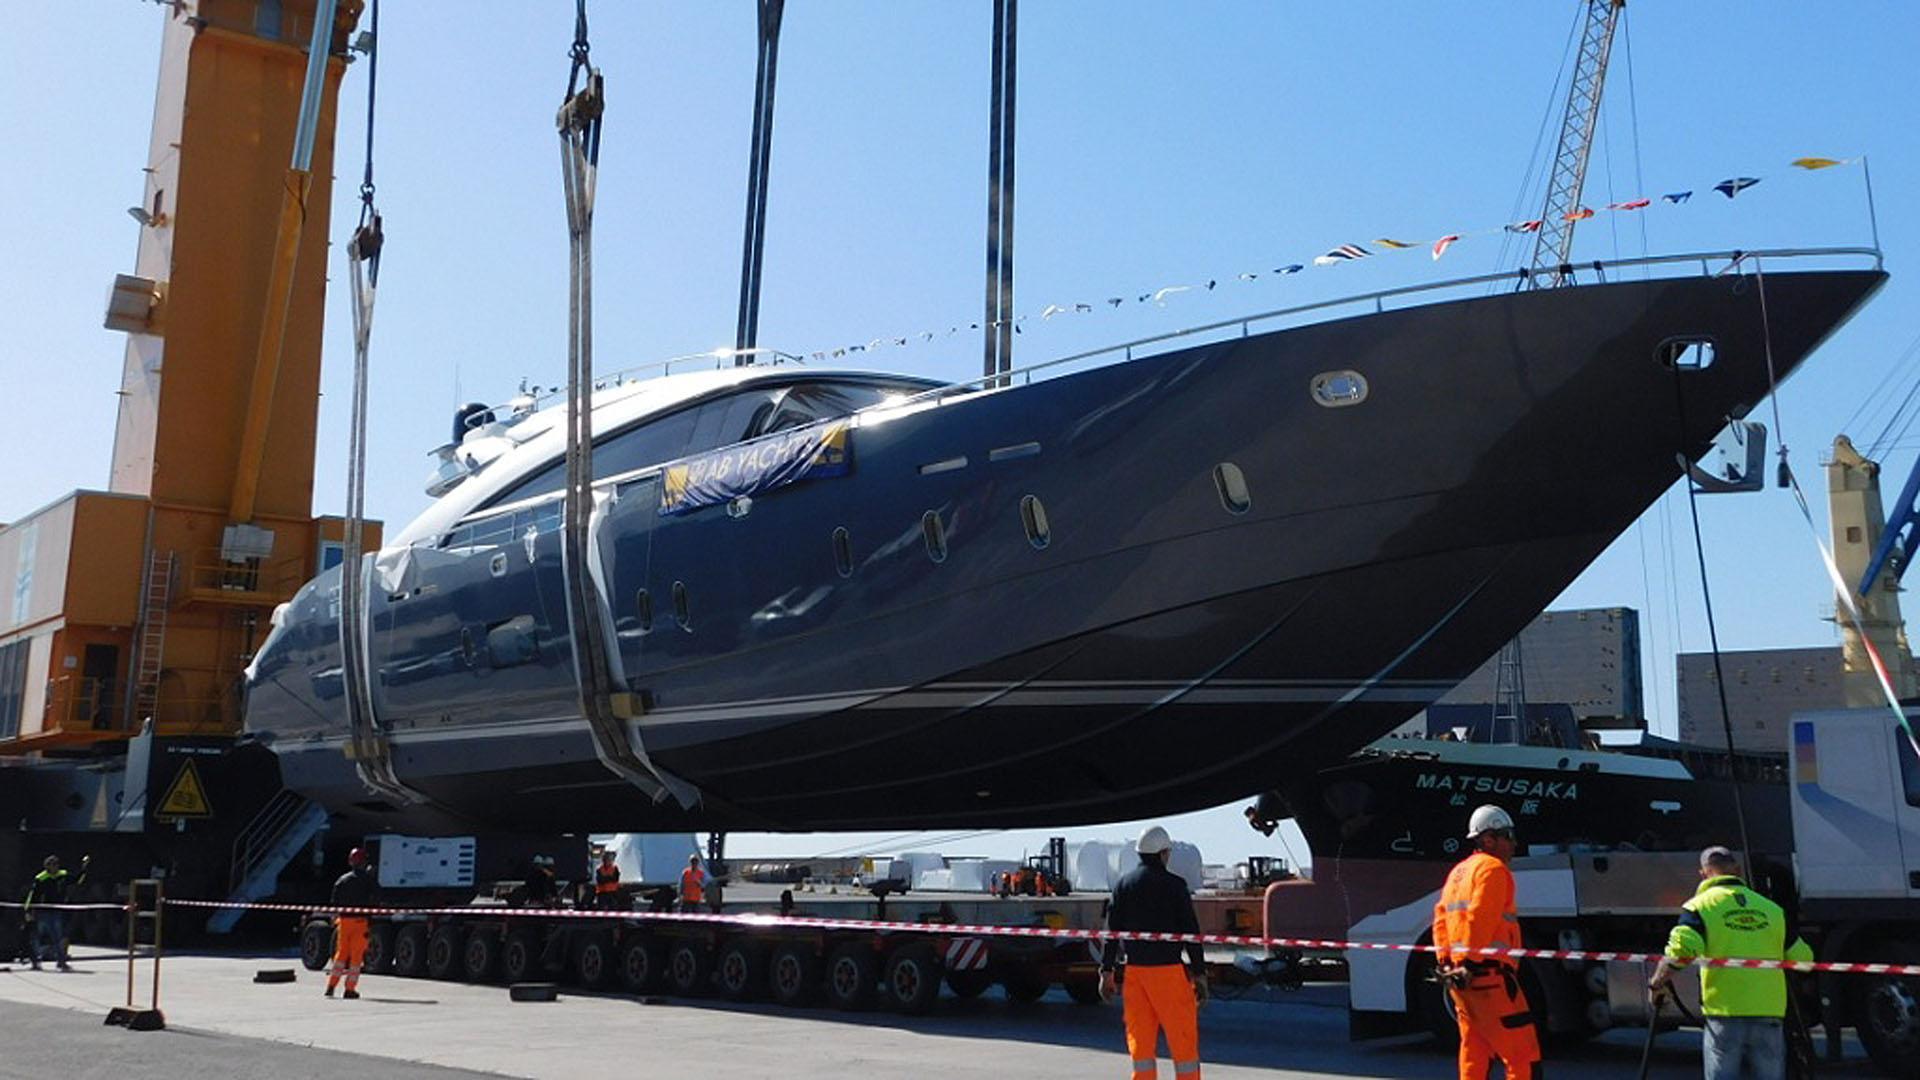 ab-100-motor-yacht-2016-30m-profile-launch